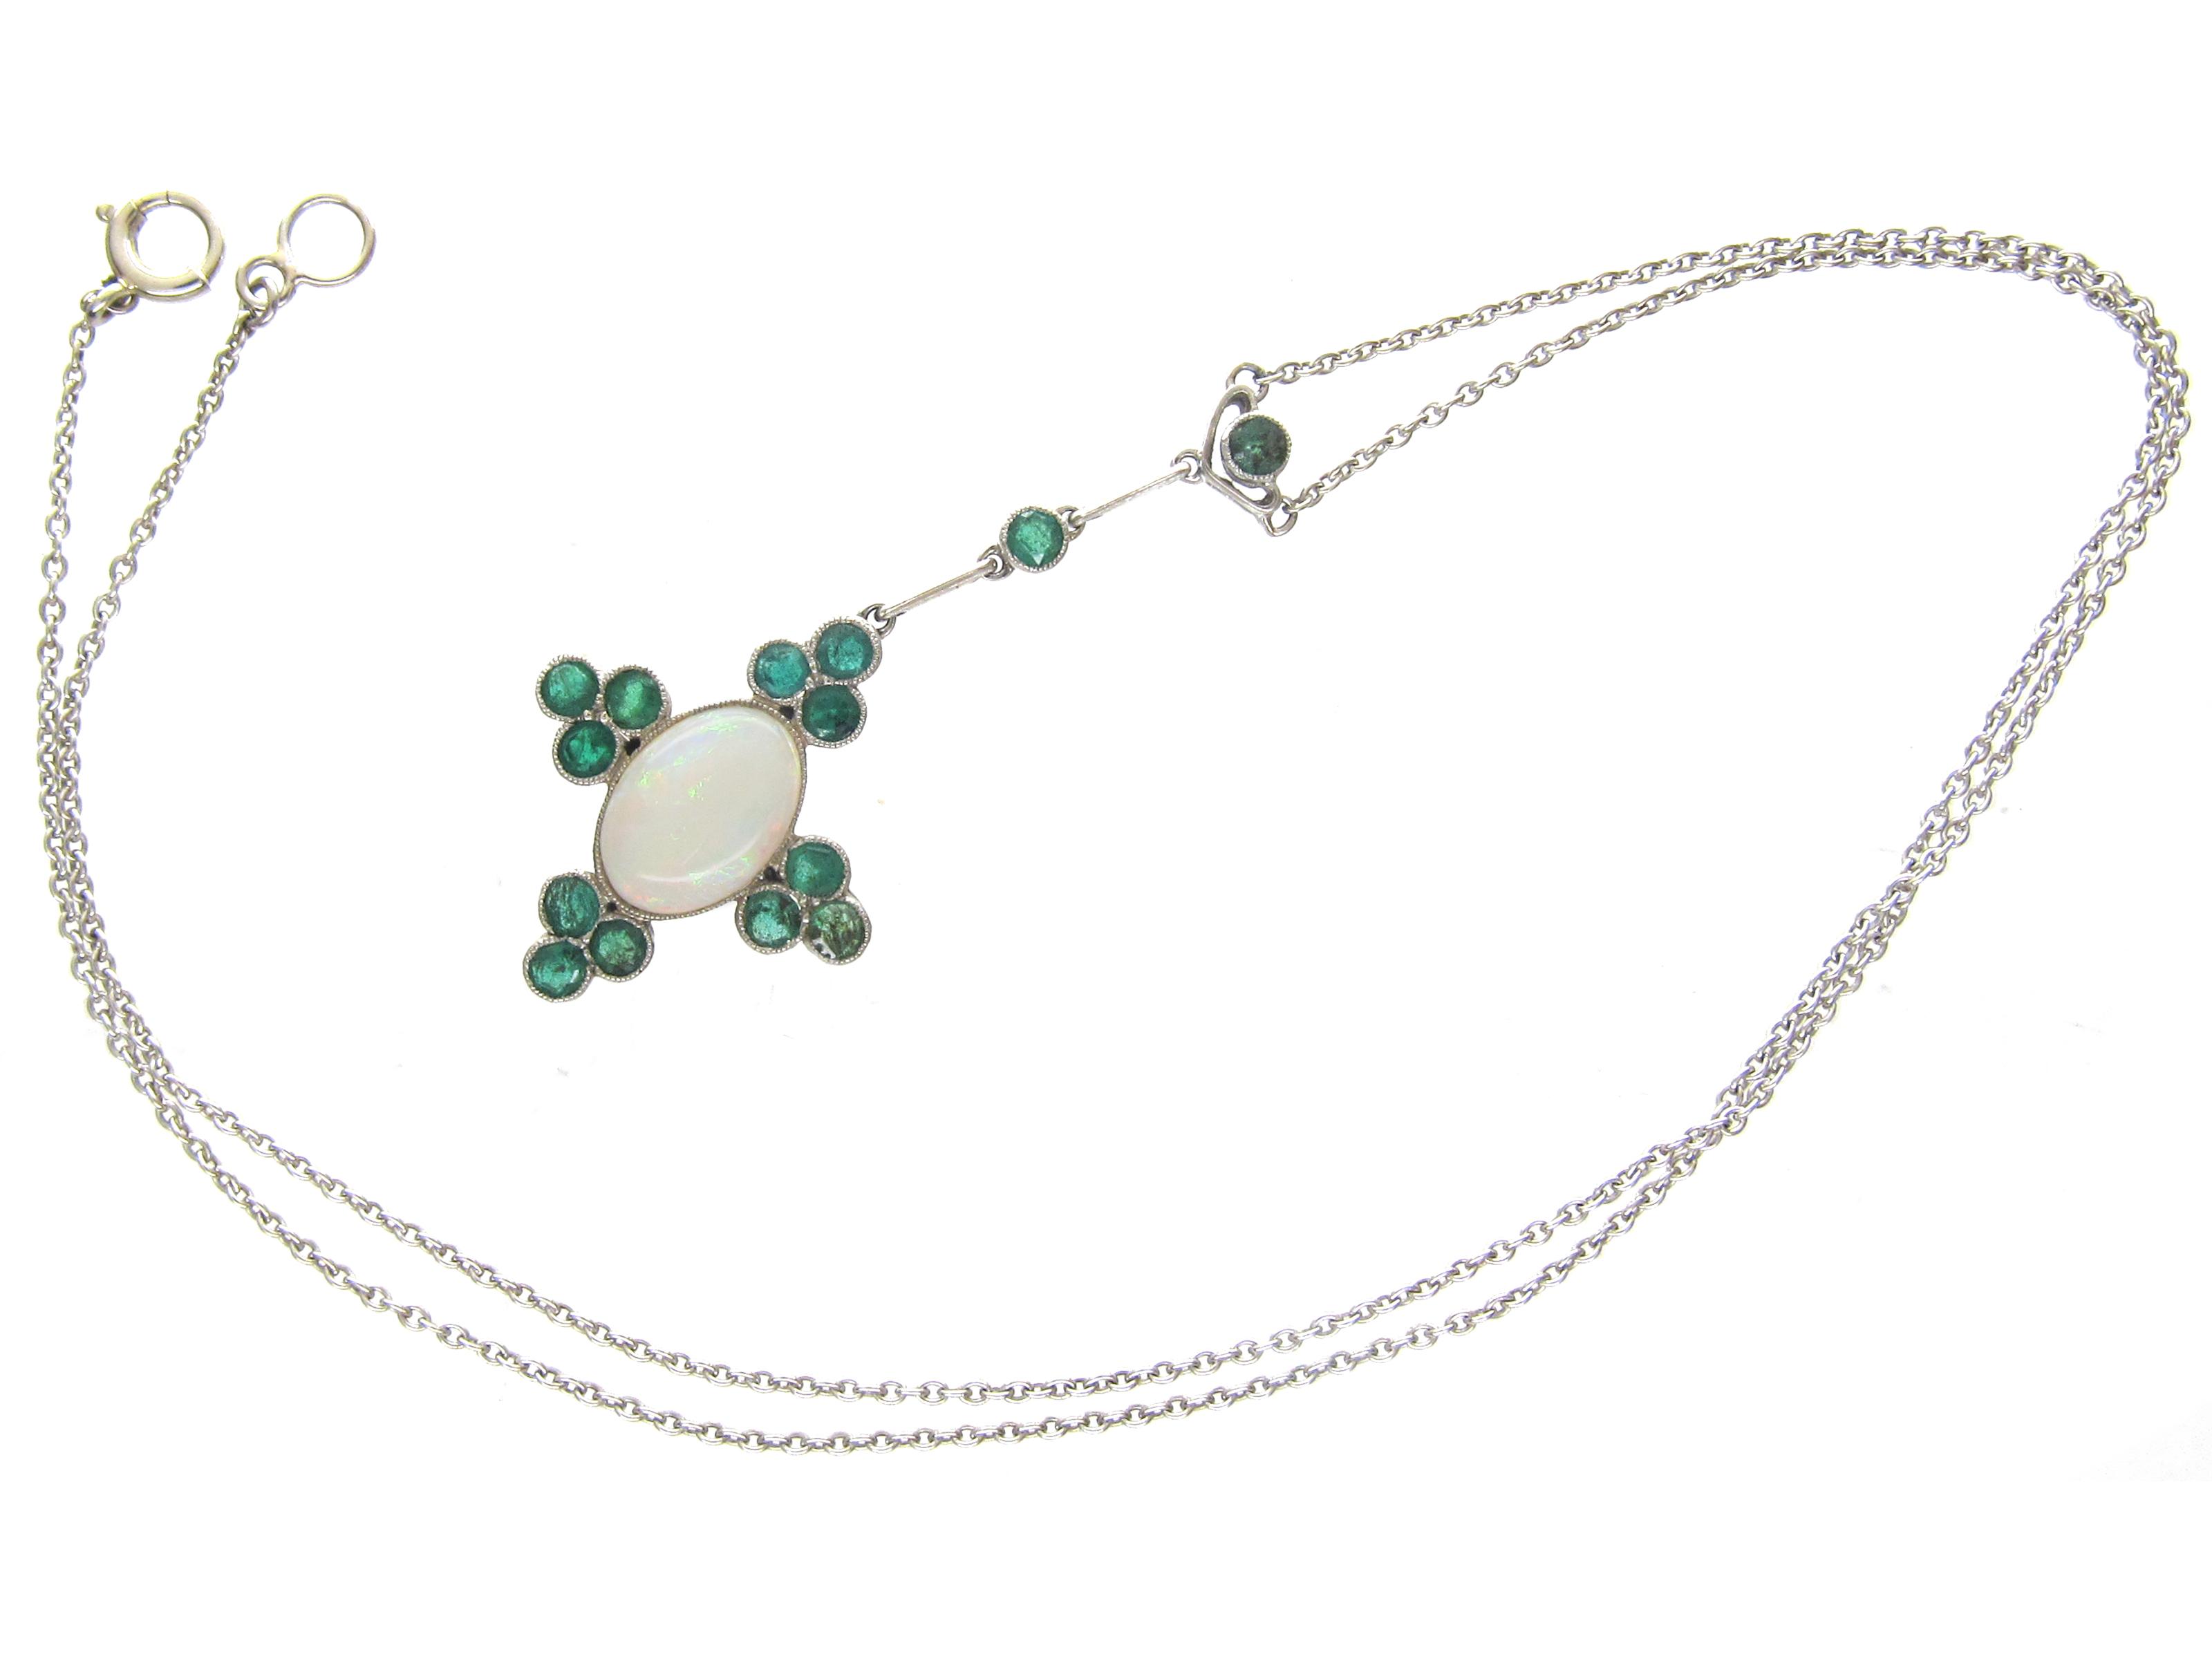 Art Deco Emerald & Opal Pendant on Chain